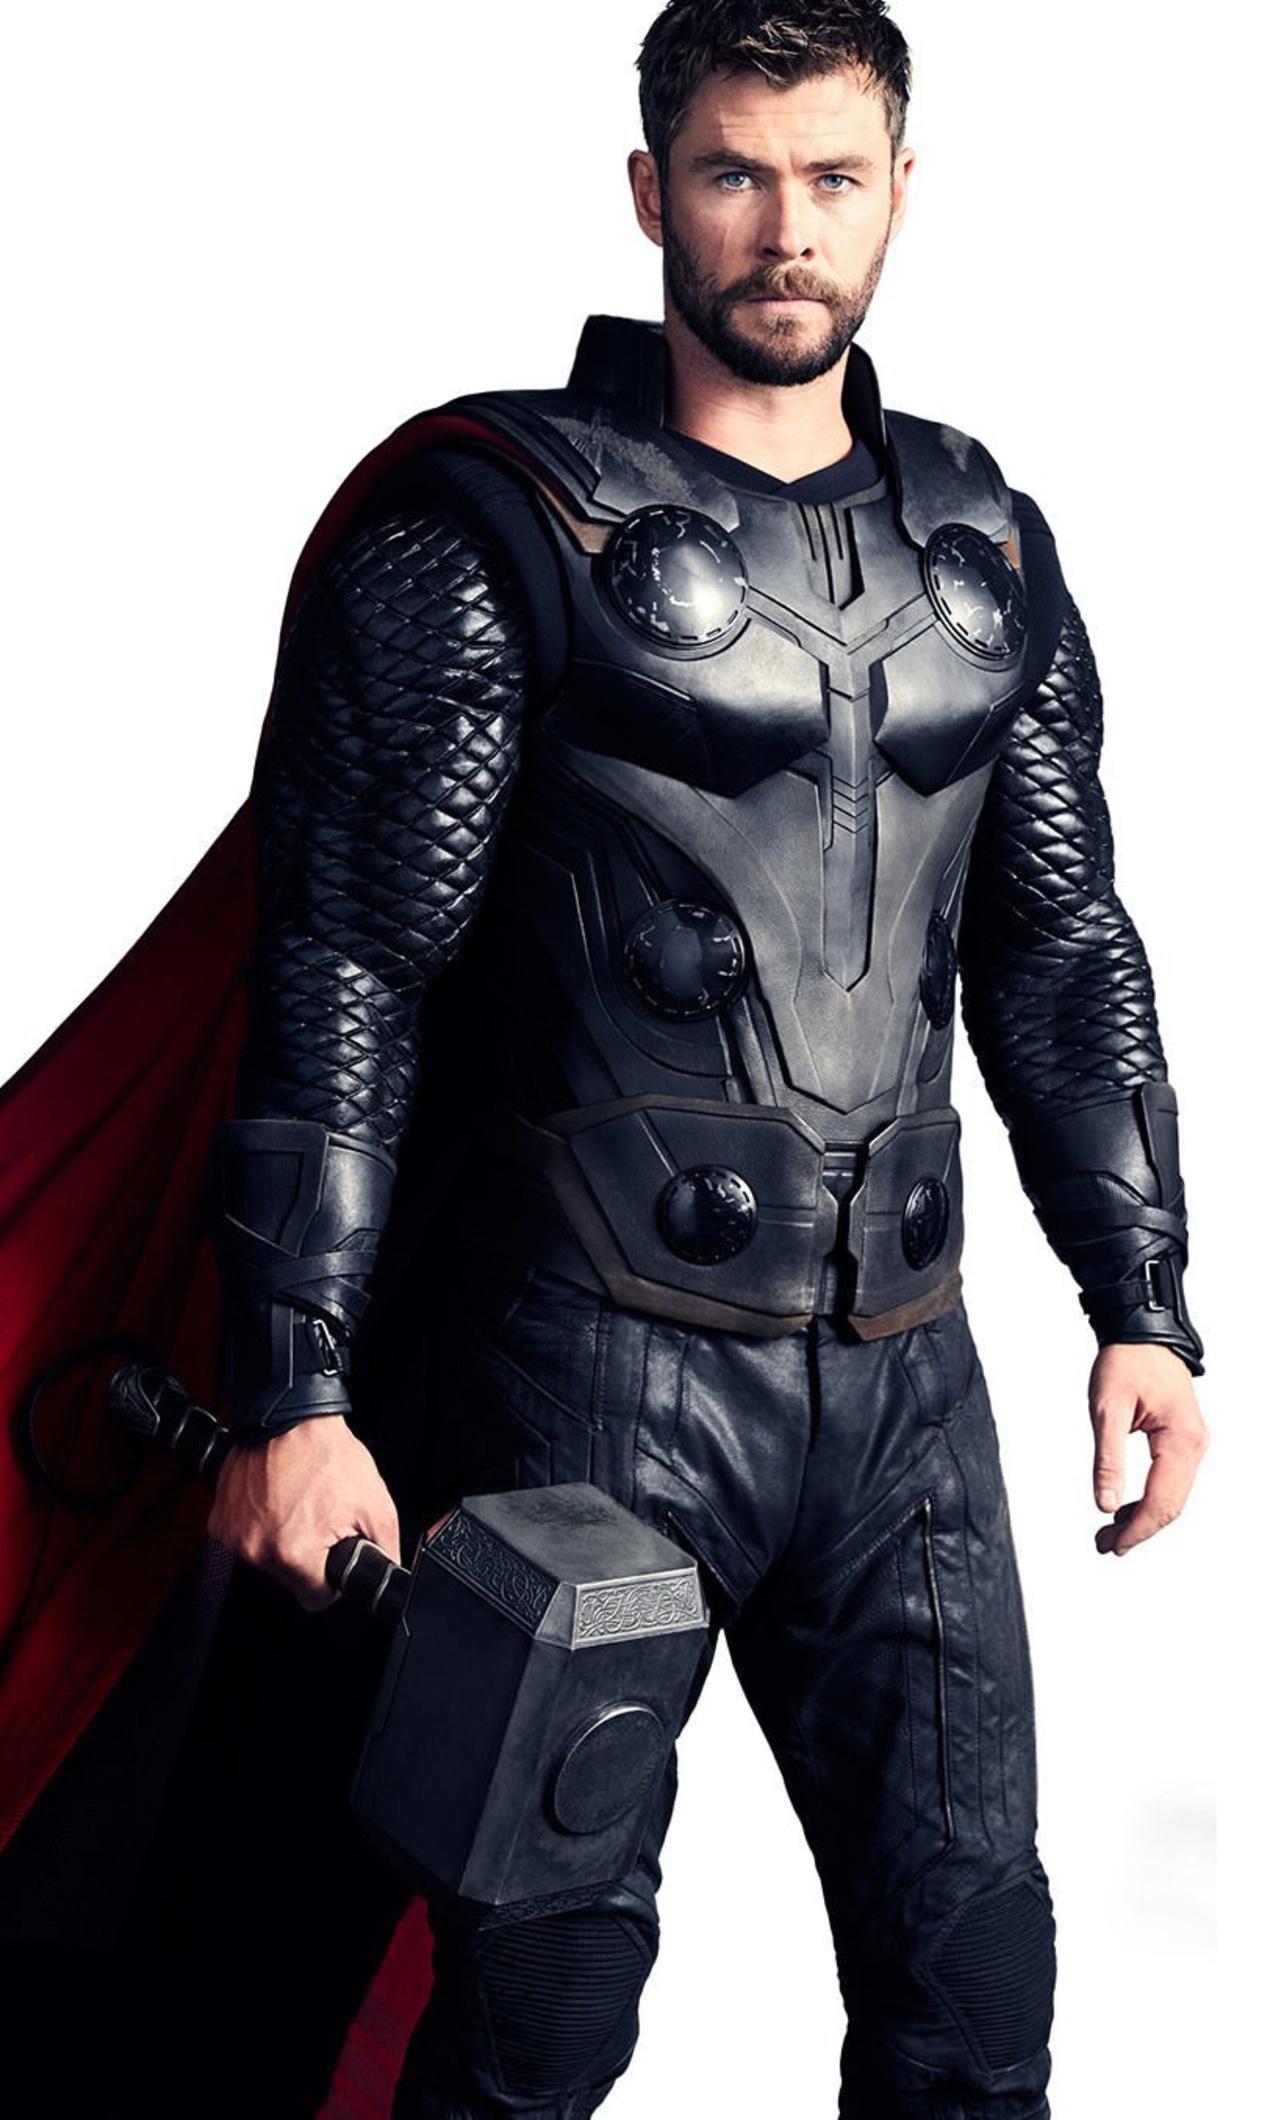 1280x2120 Thor In Avengers Infinity War 2018 Iphone 6 Hd 4k